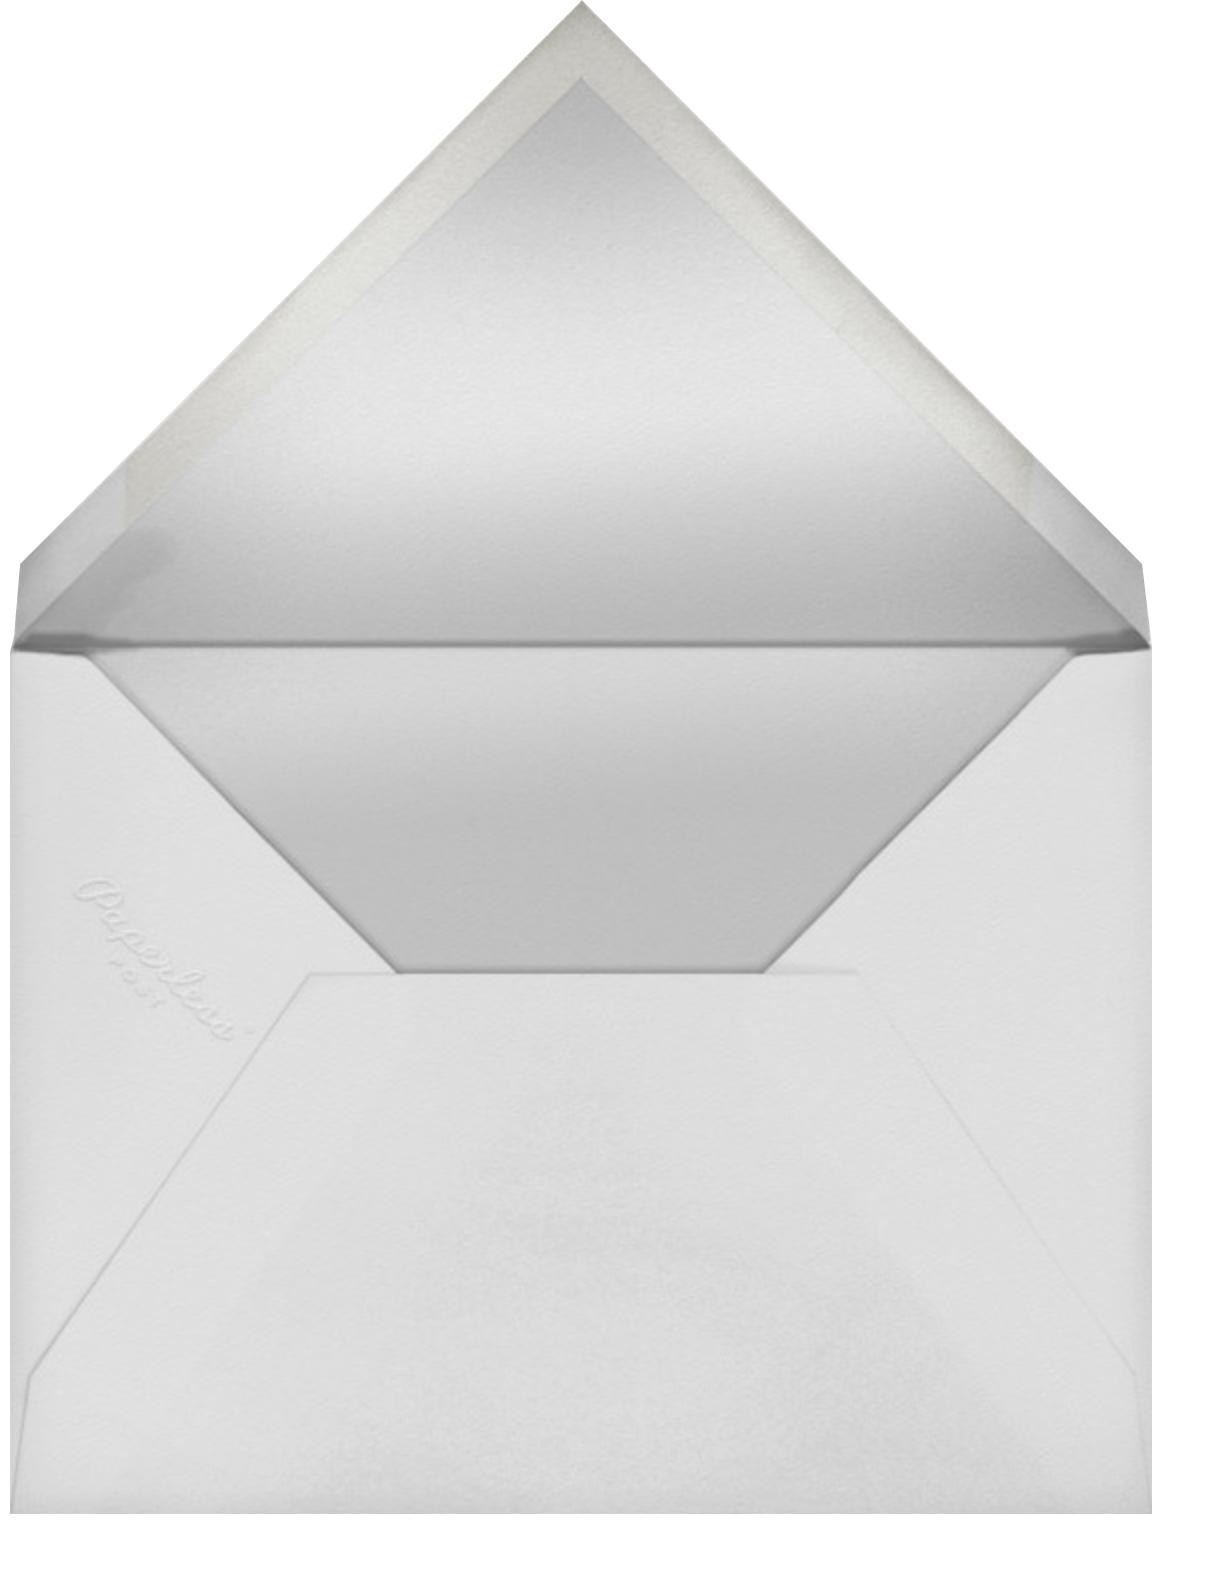 Pacified - Spring Rain - Paperless Post - Envelope